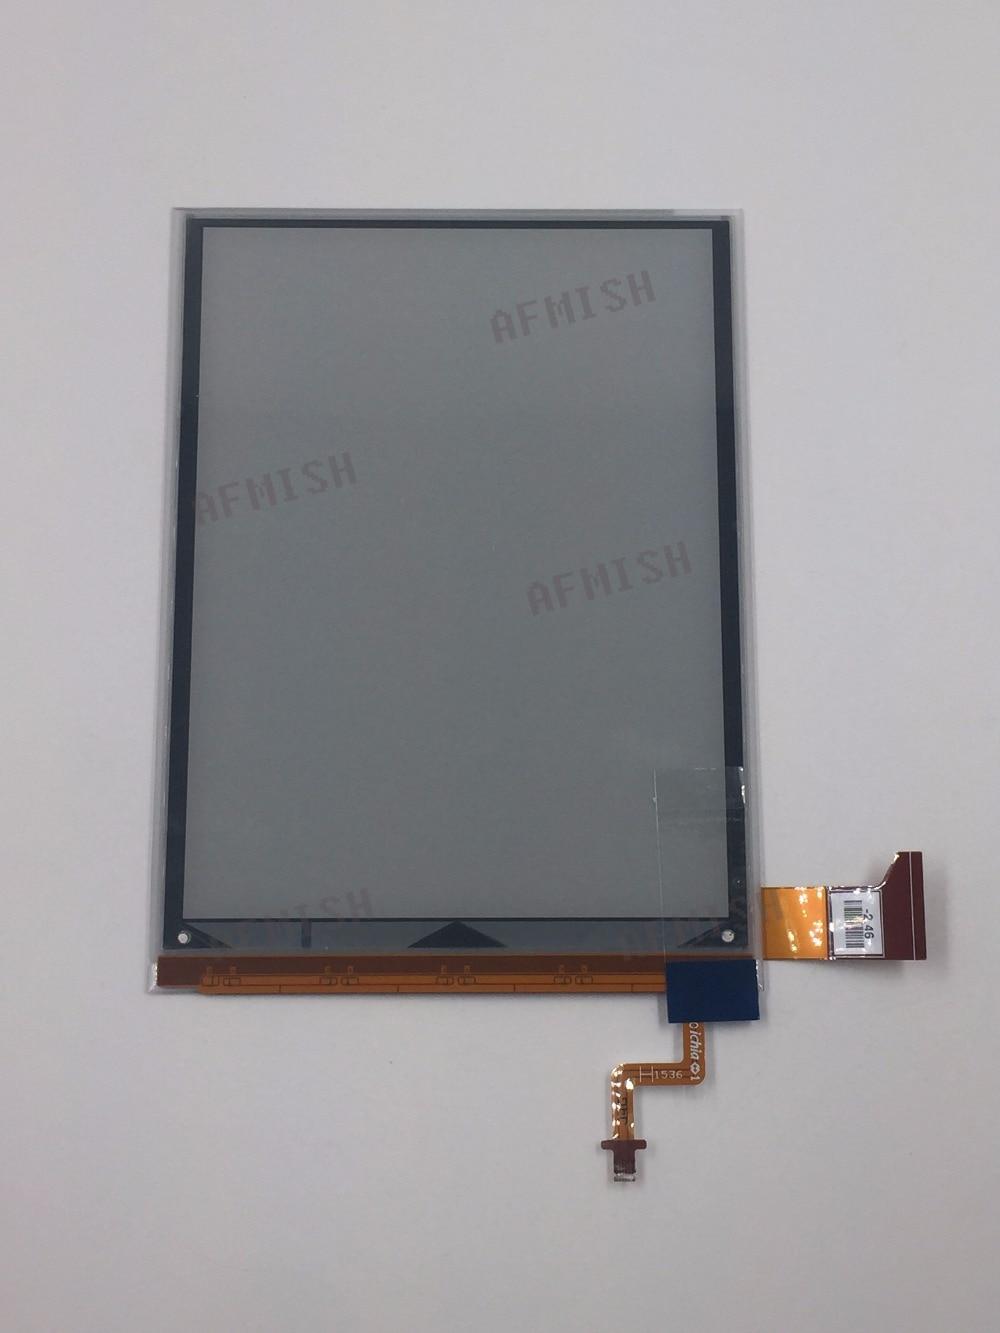 Pantalla LCD para kobo glo, lector de libros electrónicos HD con retroiluminación, sin contacto, 100%, novedad, ED060KG1, Envío Gratis